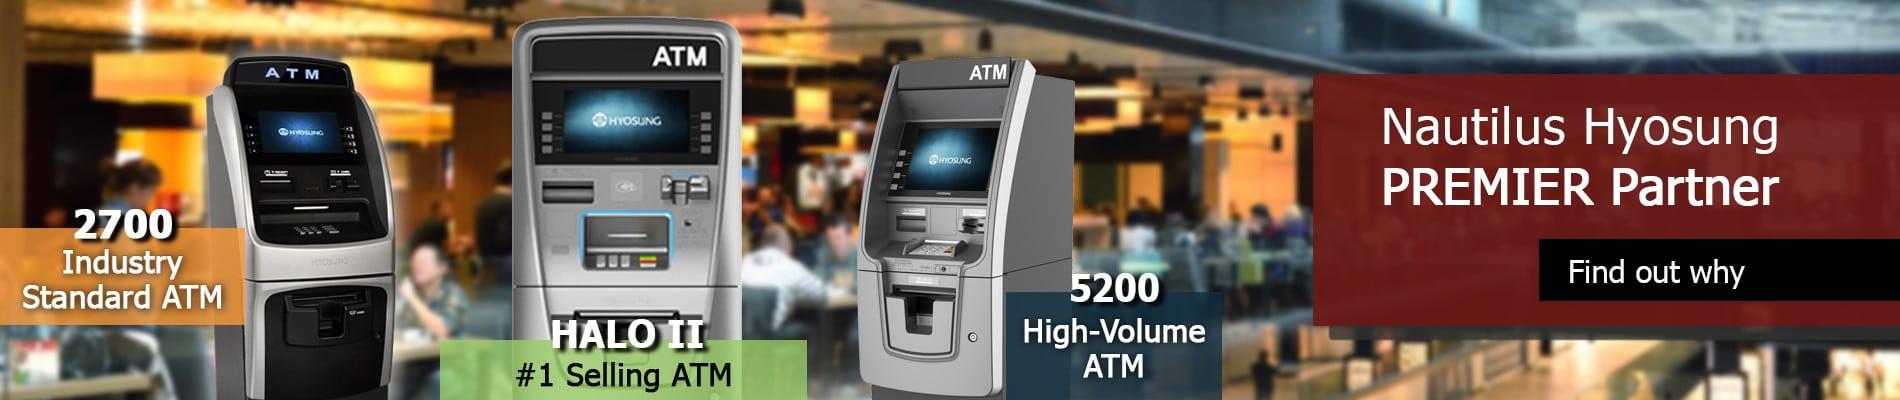 CORD Nautilis Hyosung ATMs